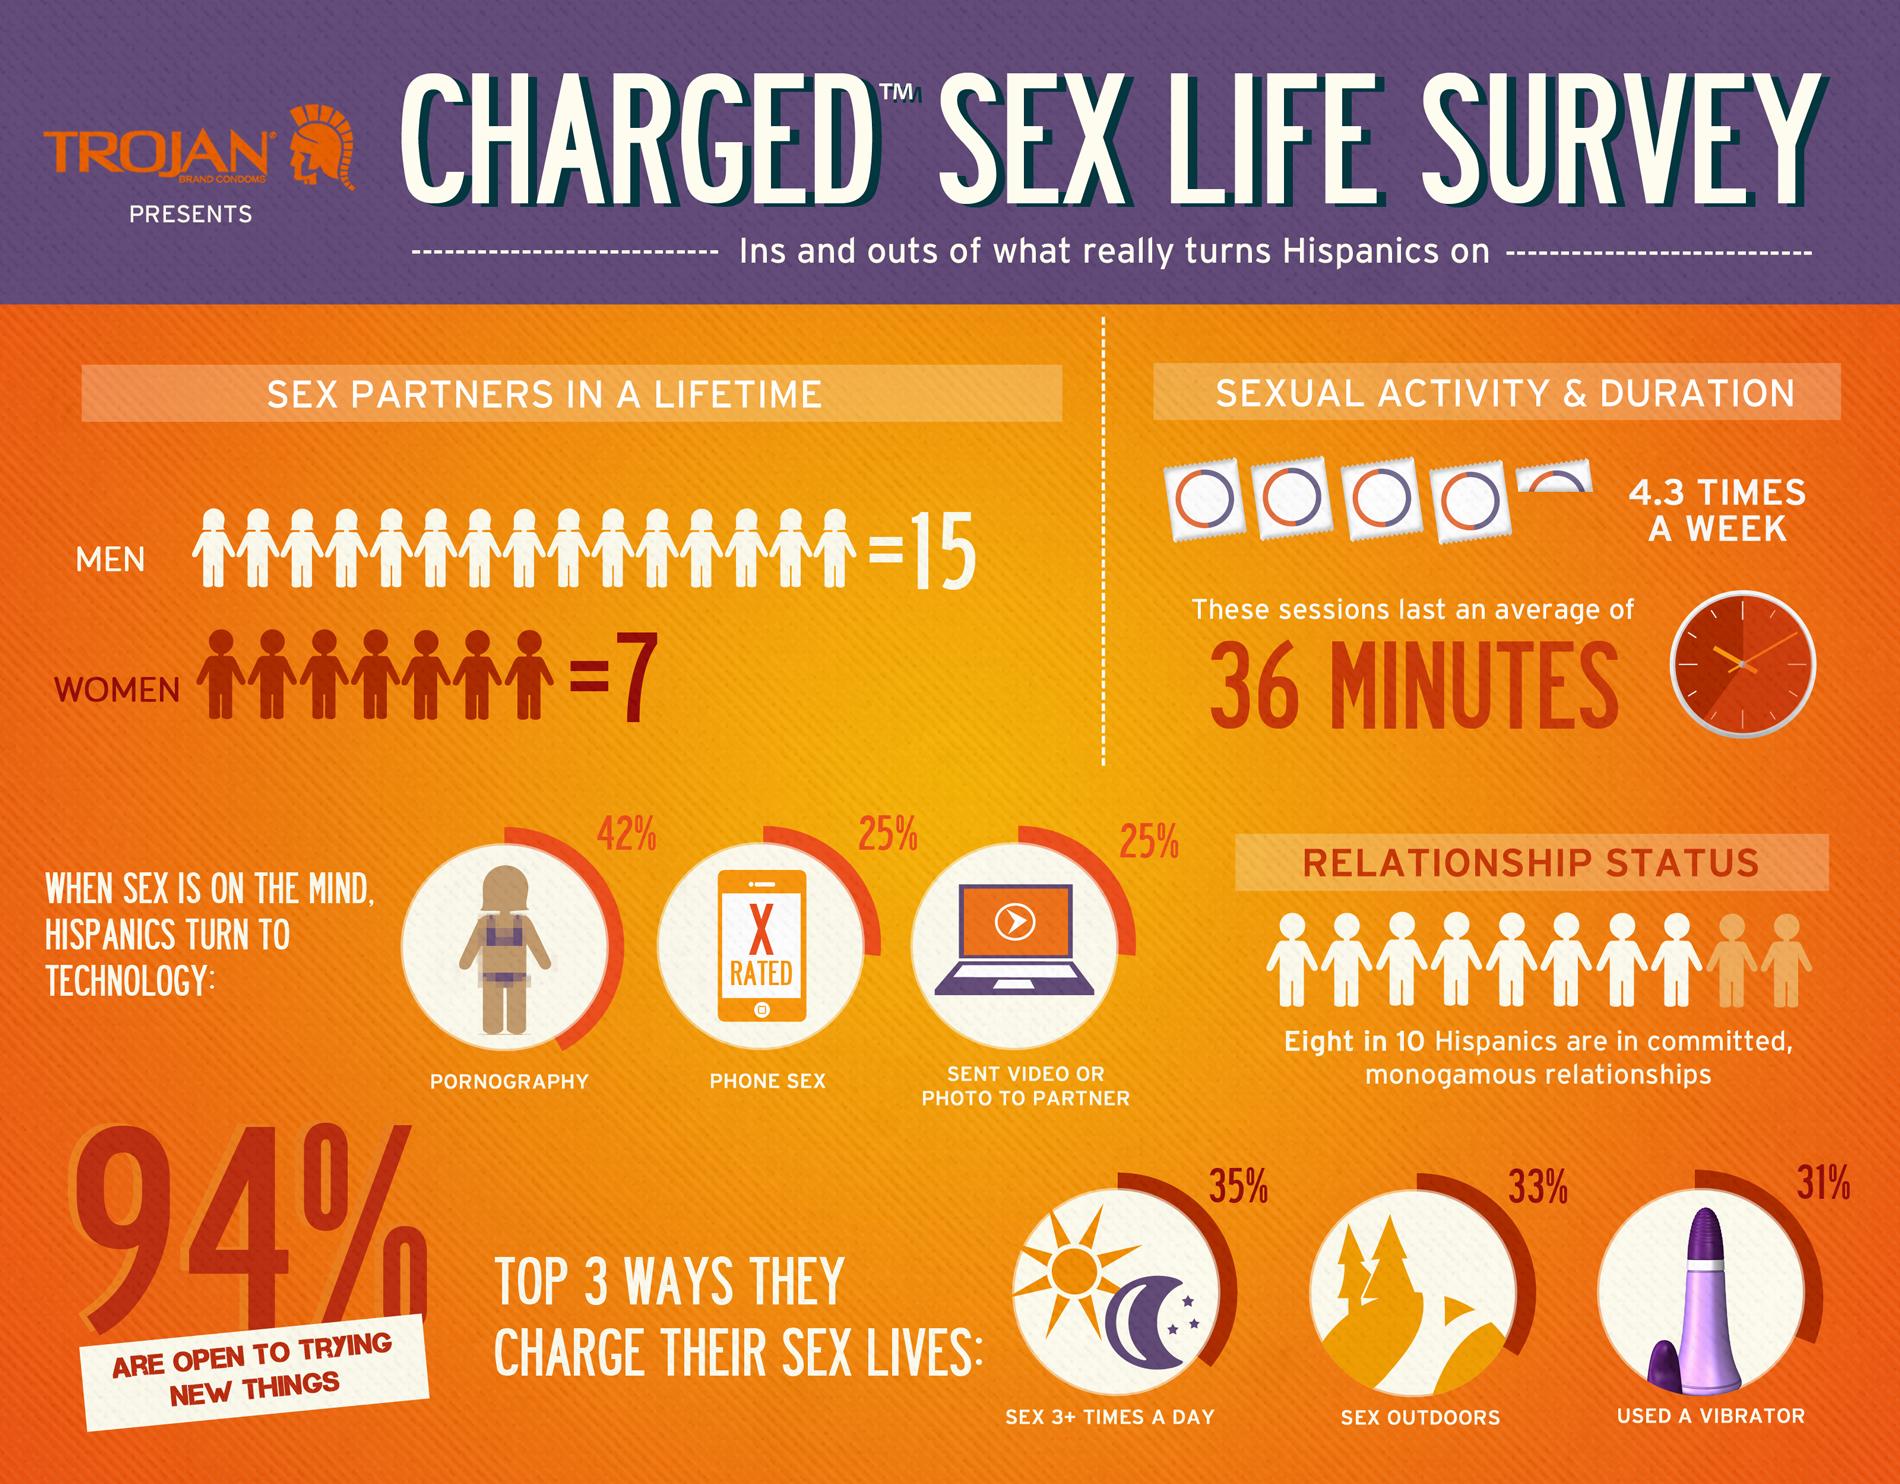 Trojan® Charged™ Hispanic Sex Life Survey